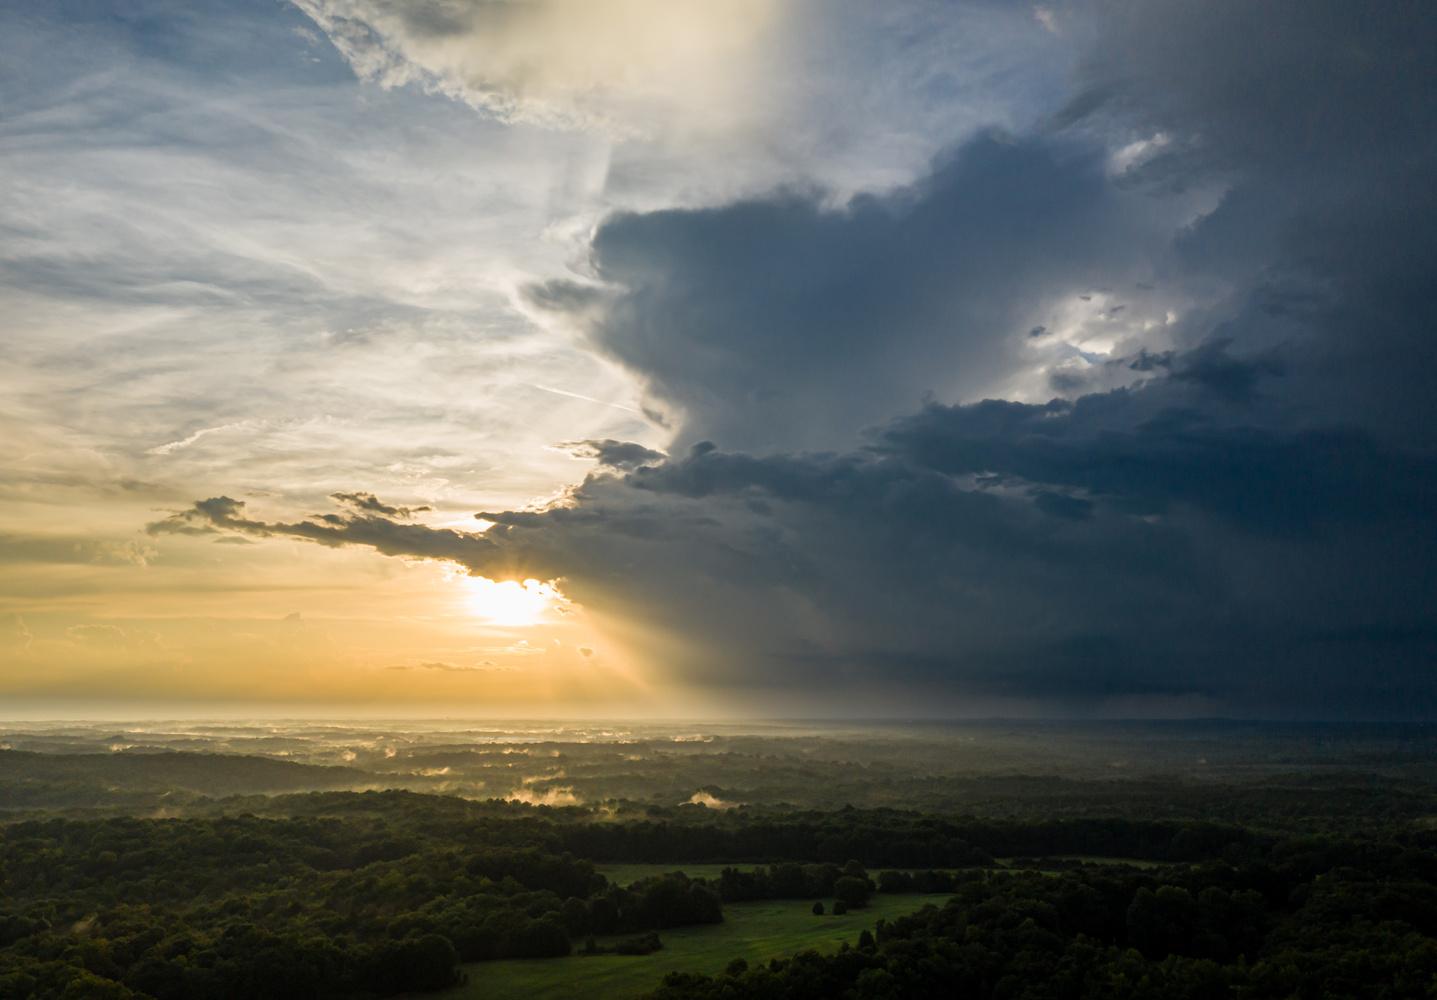 Summer Storm -- July 5, 2019 by Mark Guinn